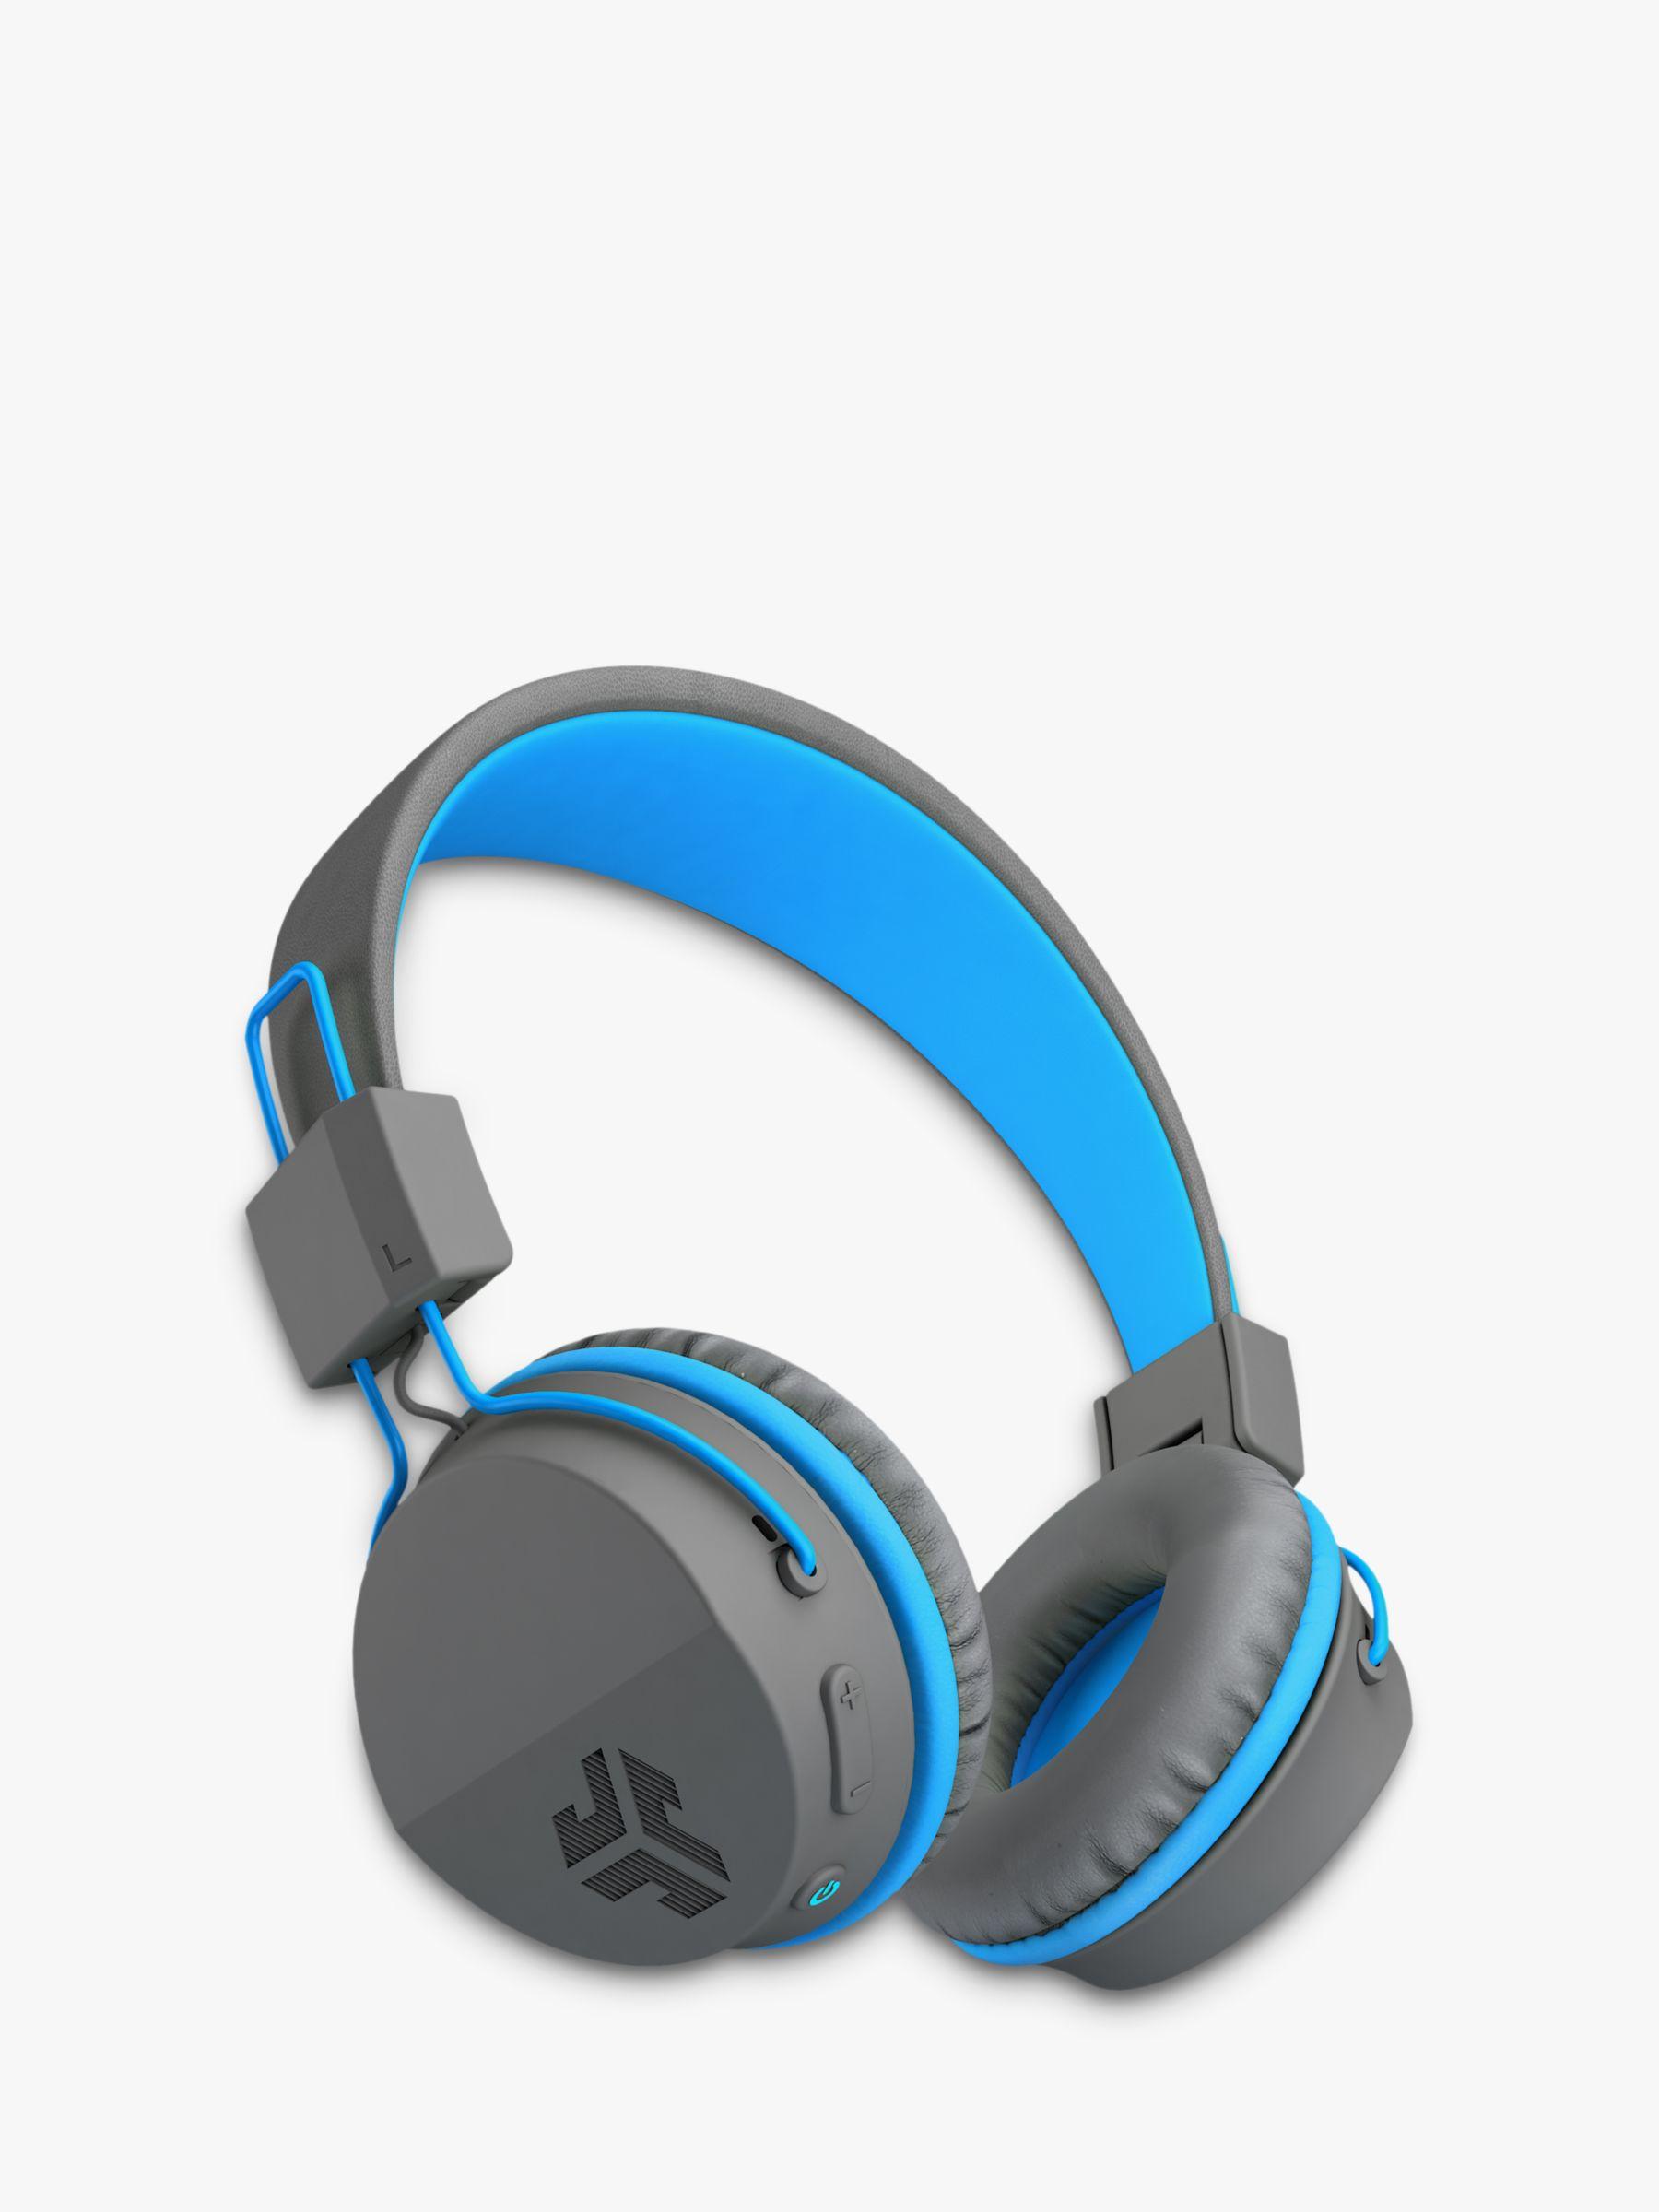 07c8be6c6d2 JLab Audio JBuddies Studio Wireless Bluetooth Children's Volume Limiting  Over-Ear Headphones with Mic/Remote at John Lewis & Partners